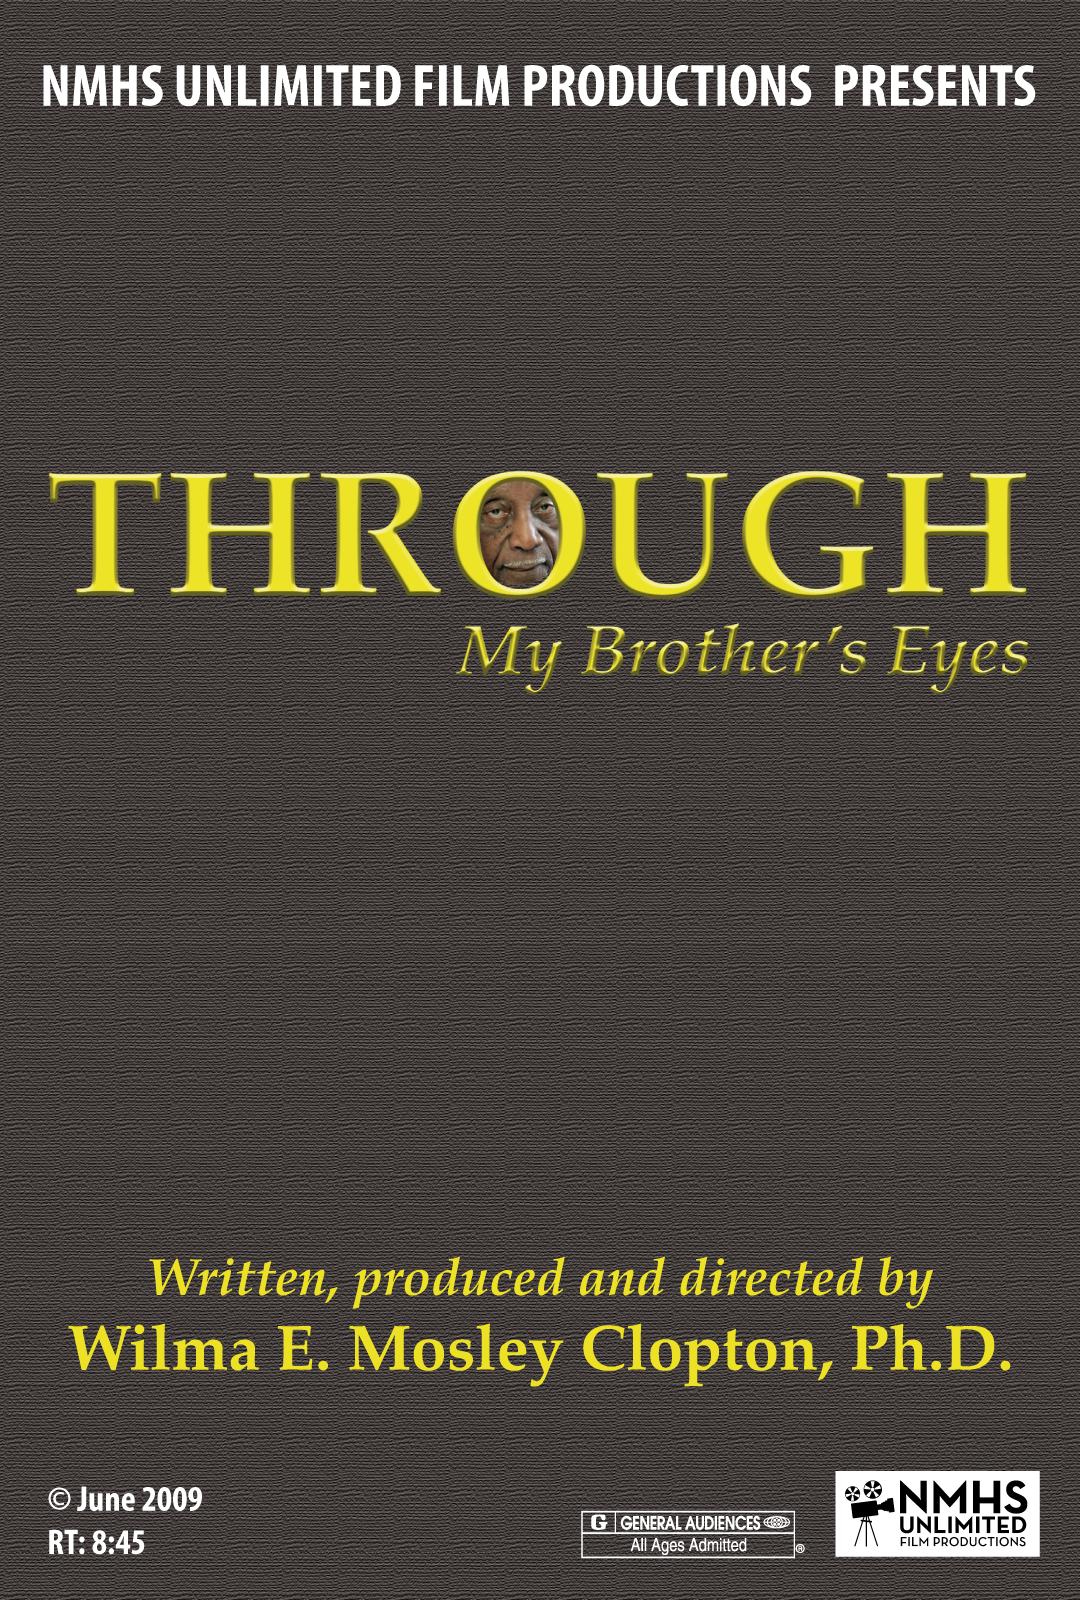 through_my_brothers_eyes_vimeo_poster_new_v1